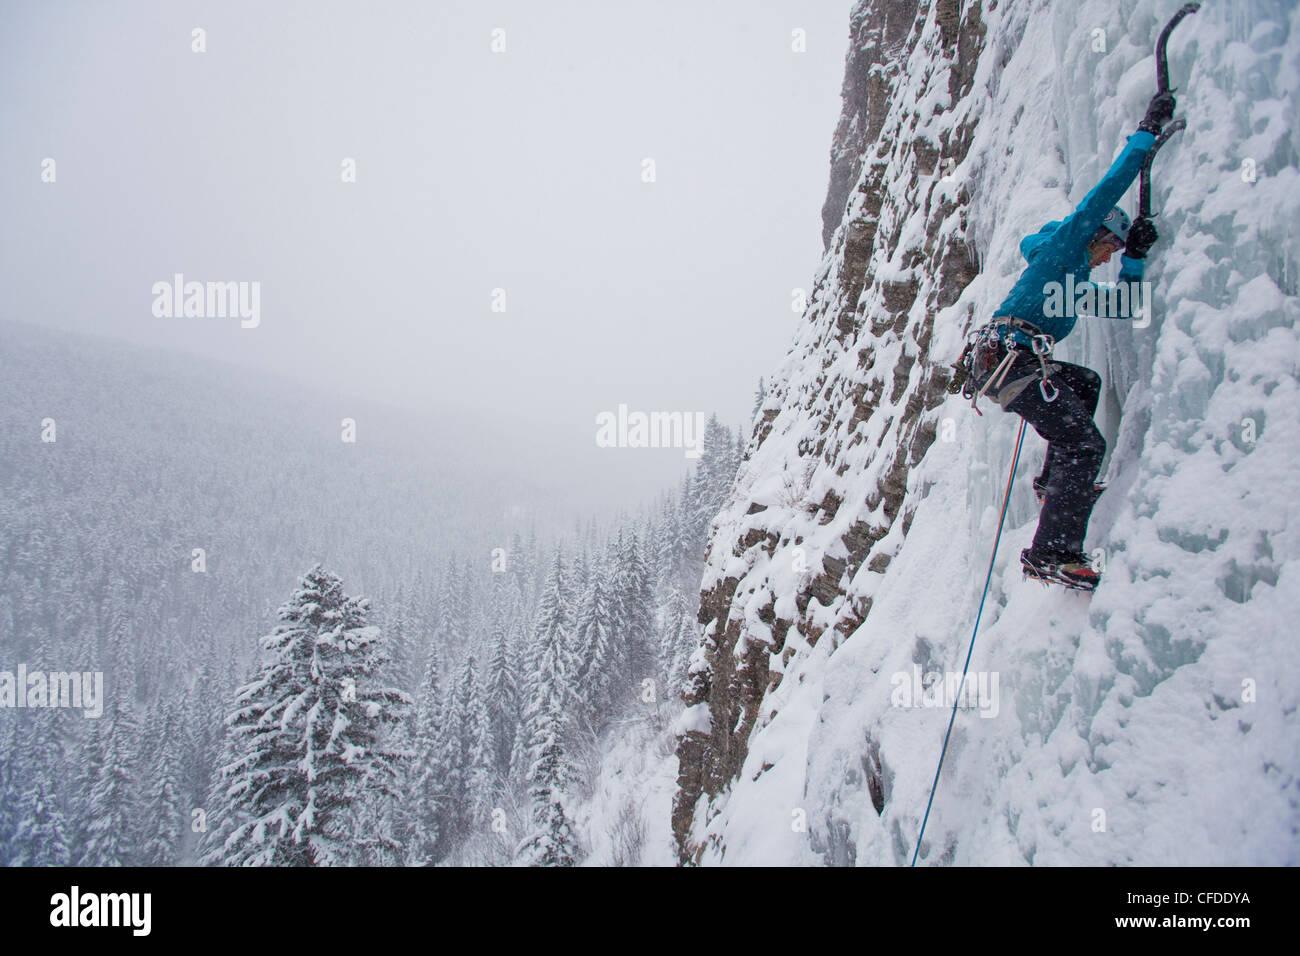 Un fort grimpeur femelle monte glace Moonlight WI4, même Thomas Creek, Kananaskis, Alberta, Canada Photo Stock